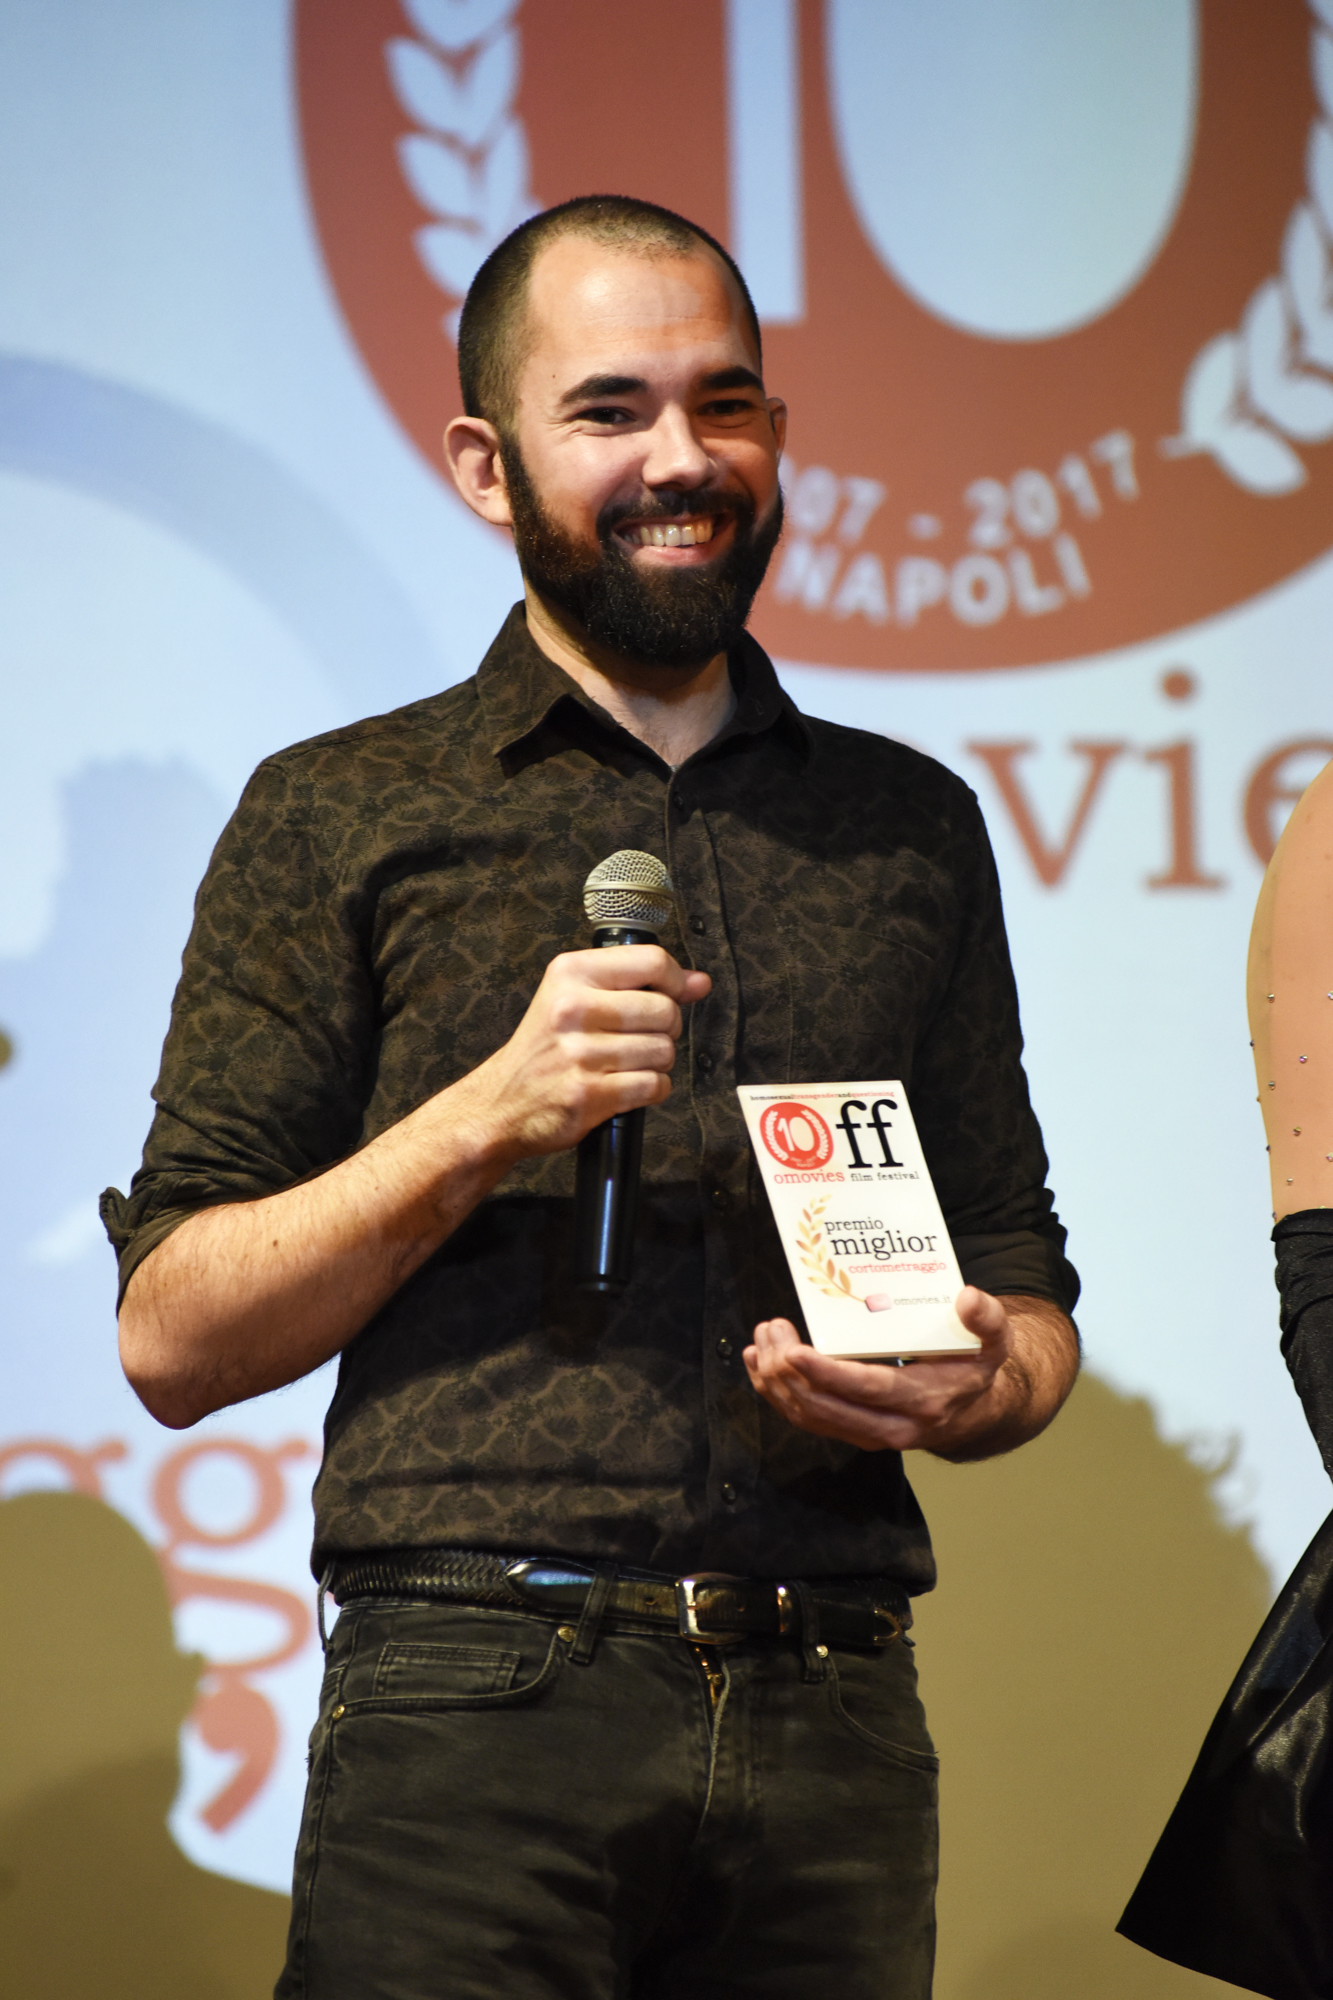 #interview the #director of the short film #Tristan #winner of the omovies film festival, Mr. Sonam Larcin #Off10